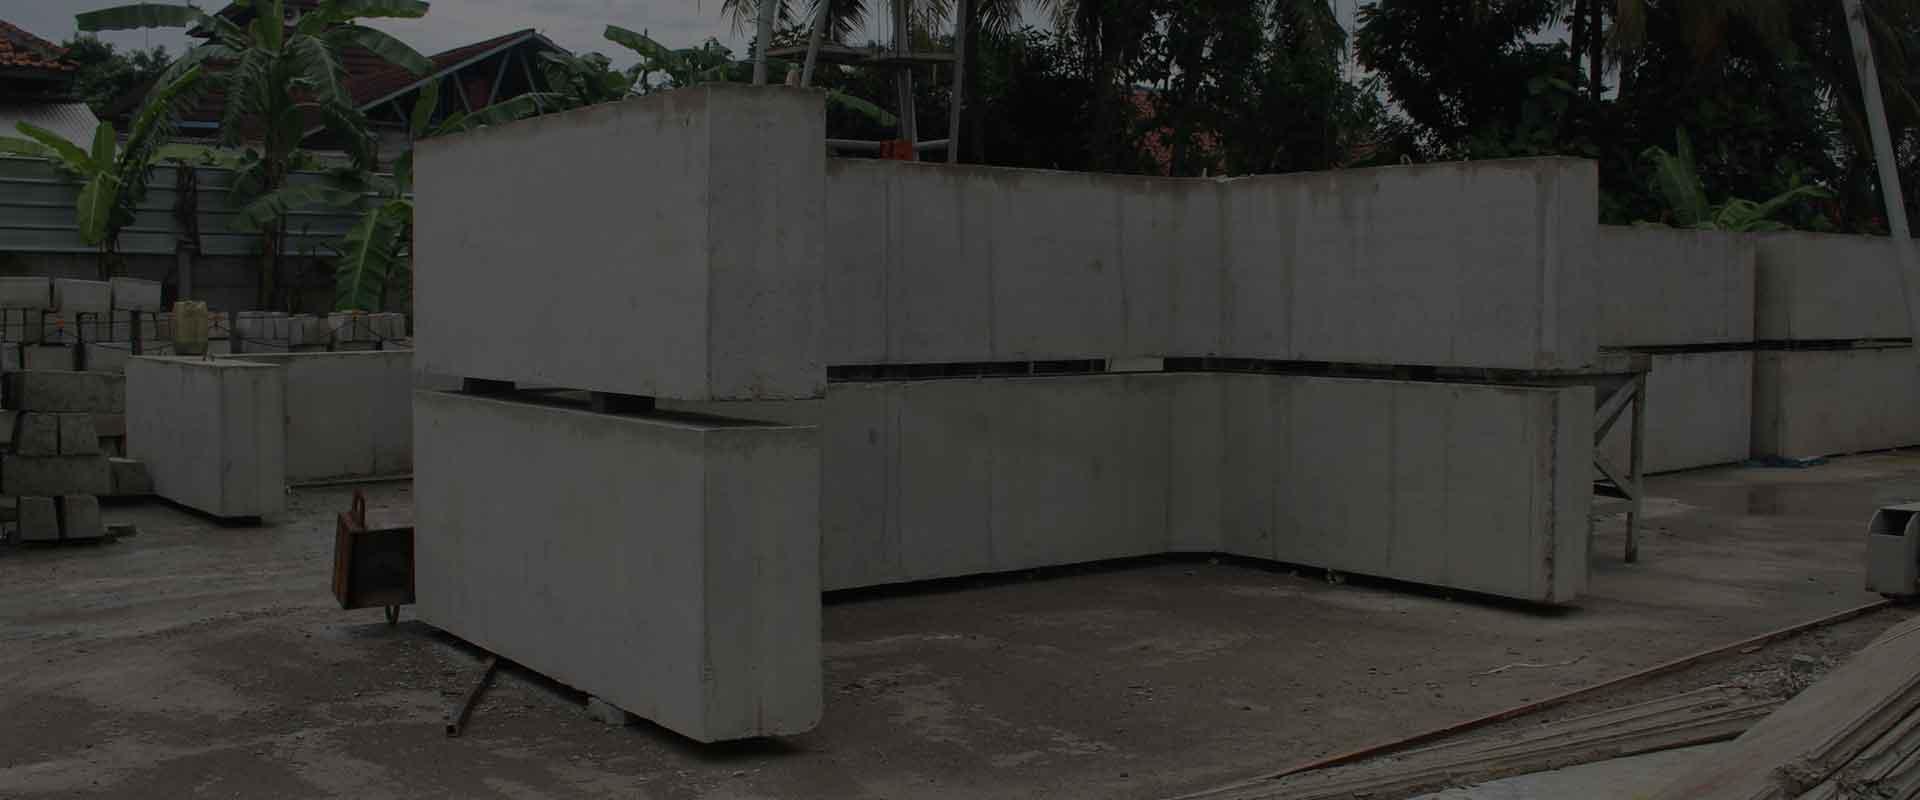 Harga Box Culvert Bandung